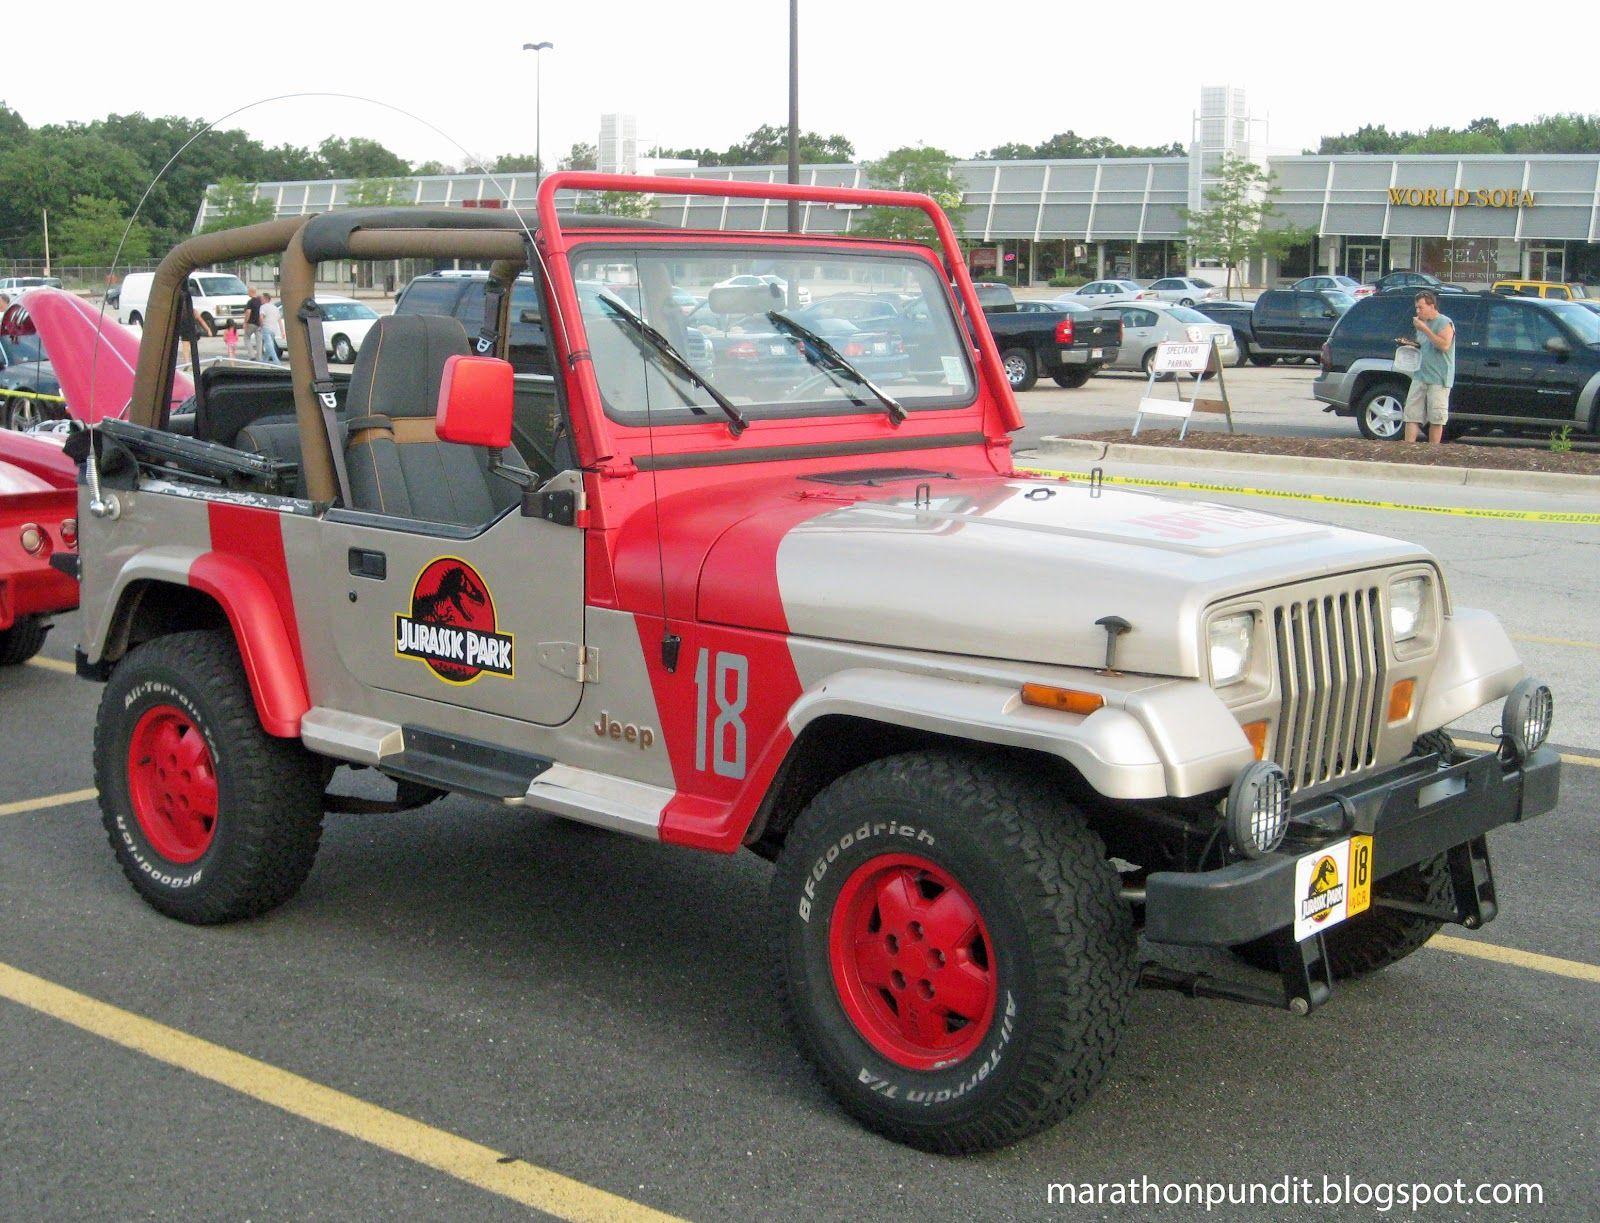 jurassic park jeep wrangler at the morton grove classic car show